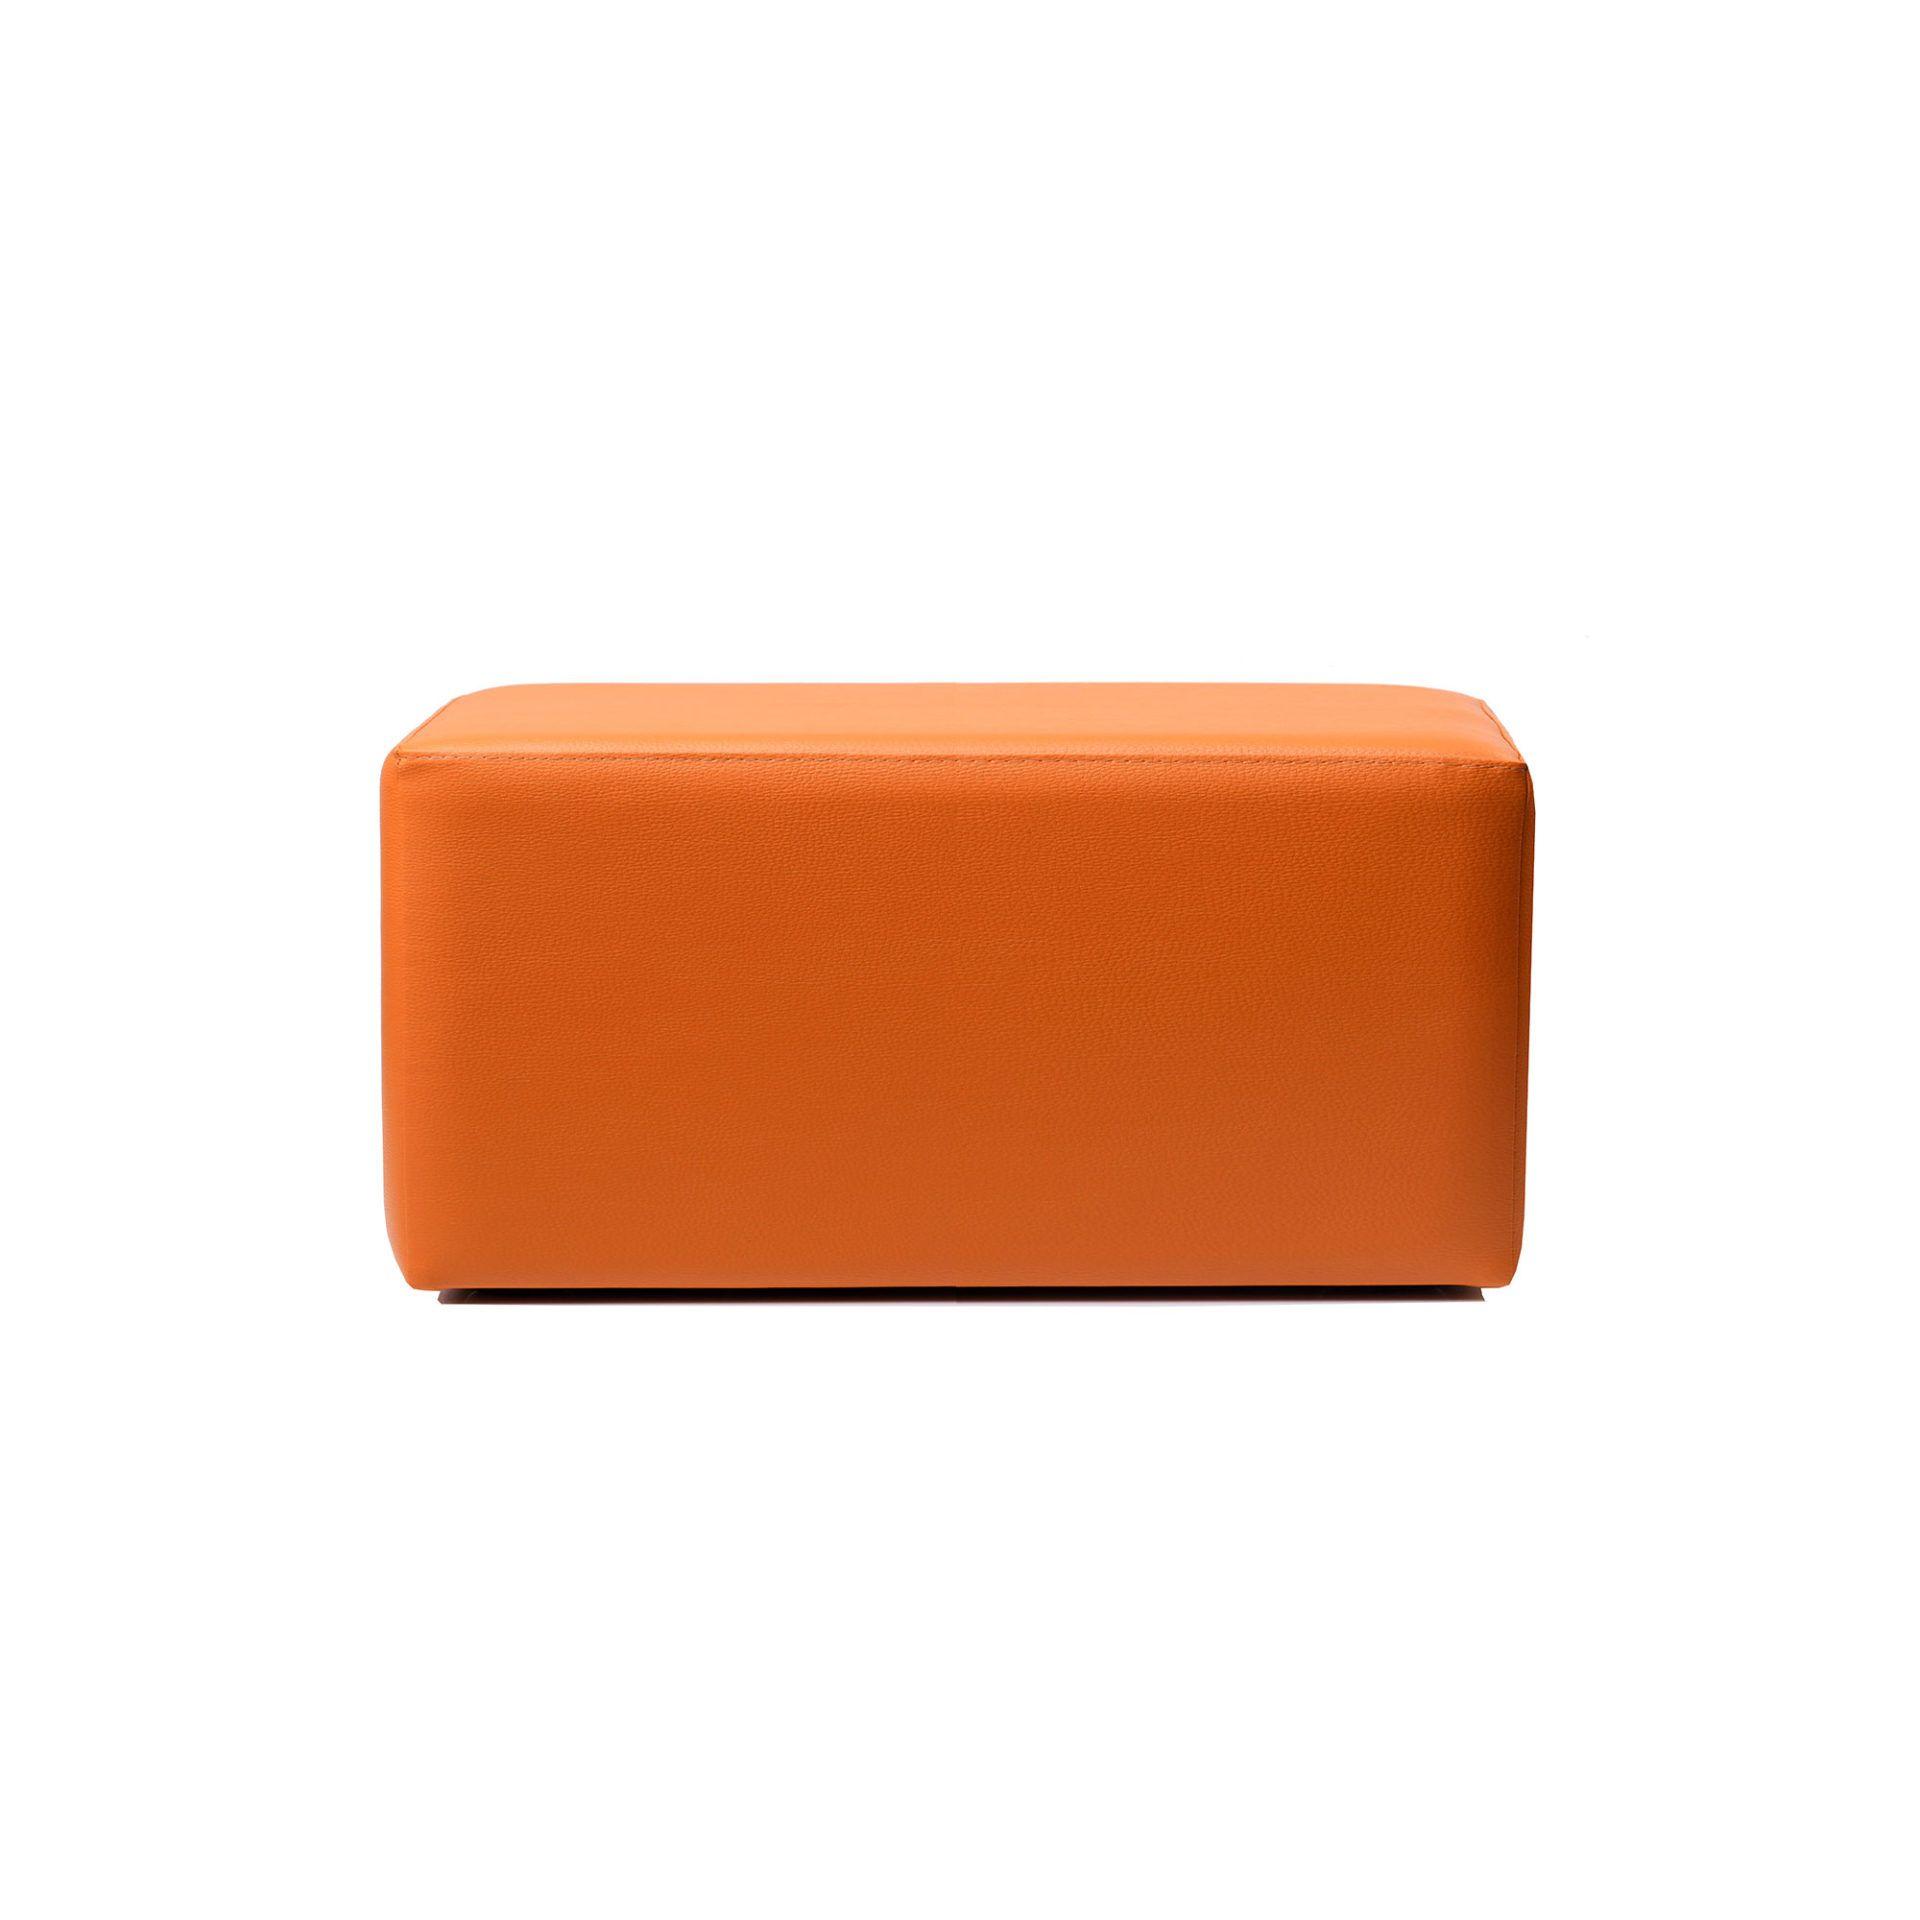 ottoman rectangle orange01